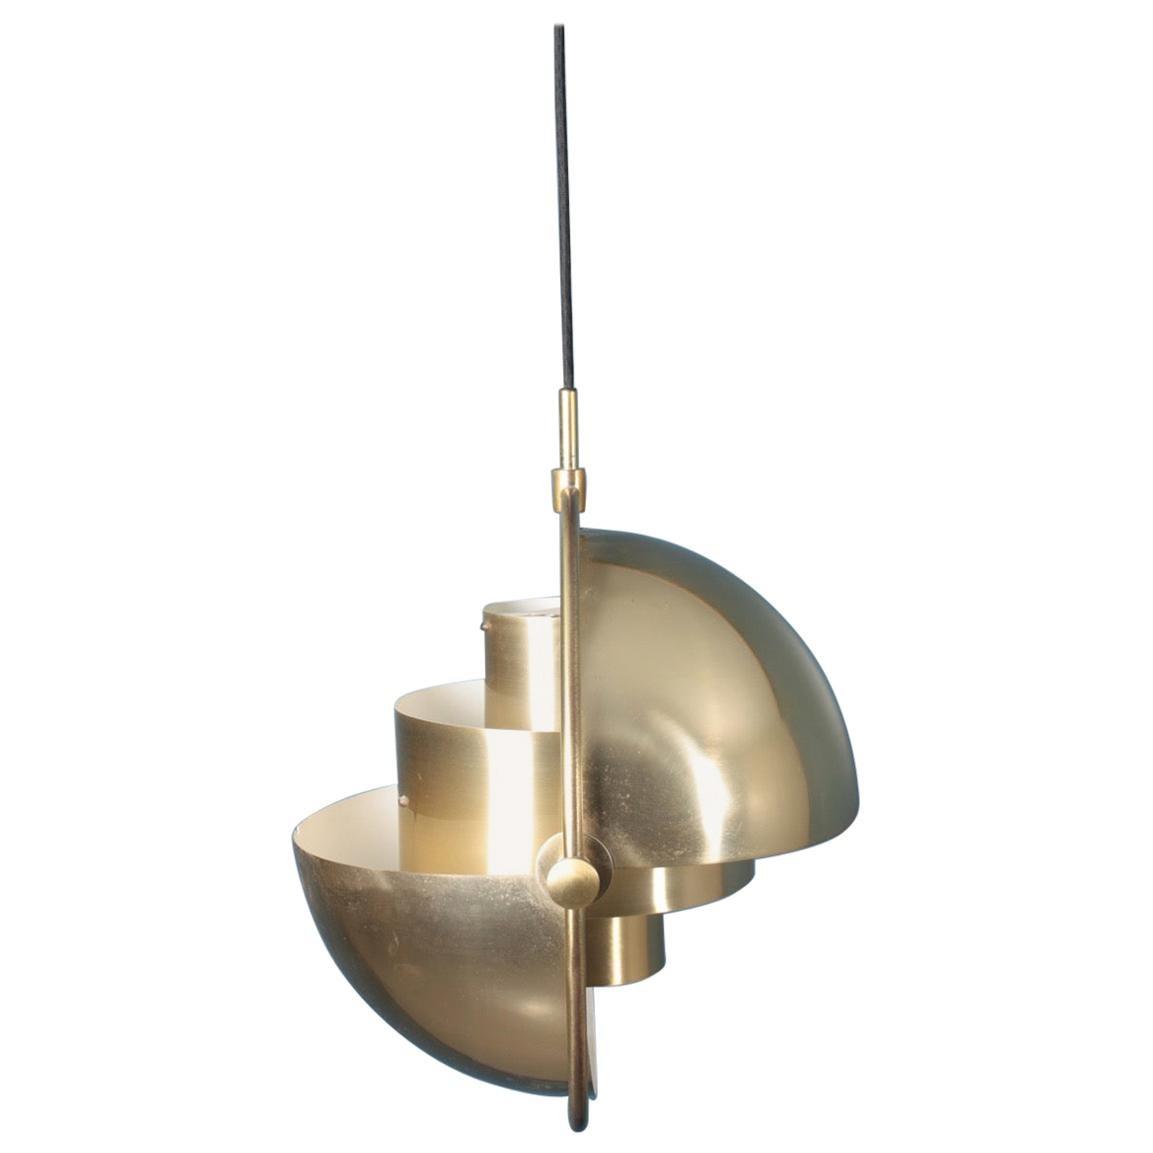 Midcentury Multi Light Pendant in Brass by Louis Weisdorf, Danish Design, 1960s